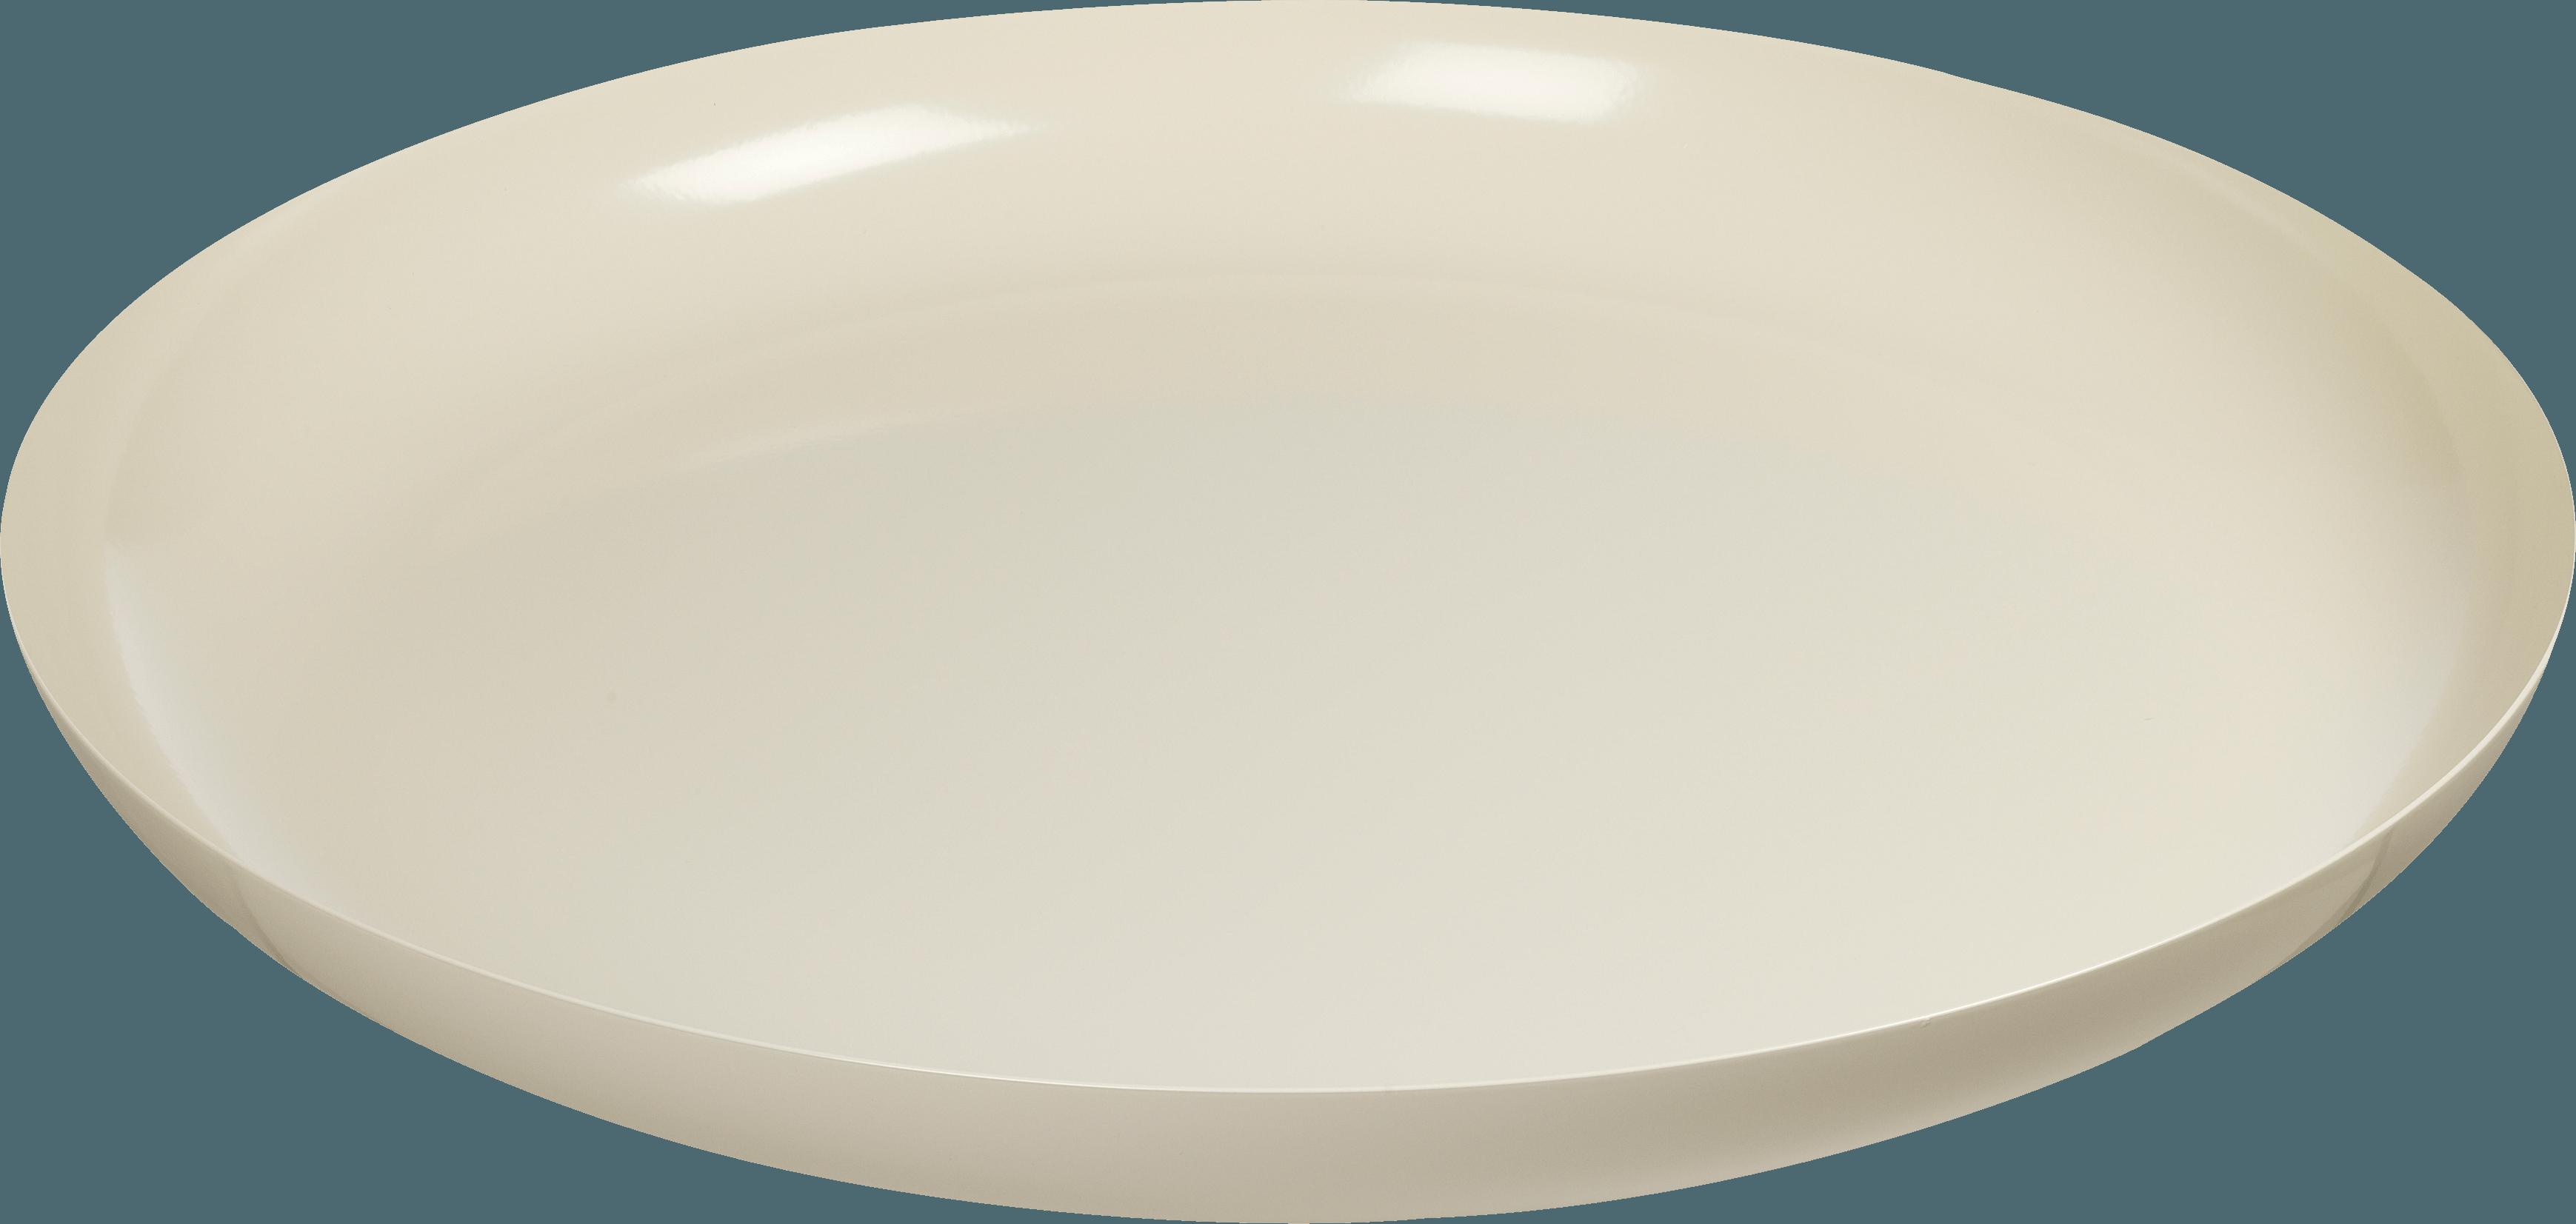 Download White Plate Png Image For Free Rem Kolhas